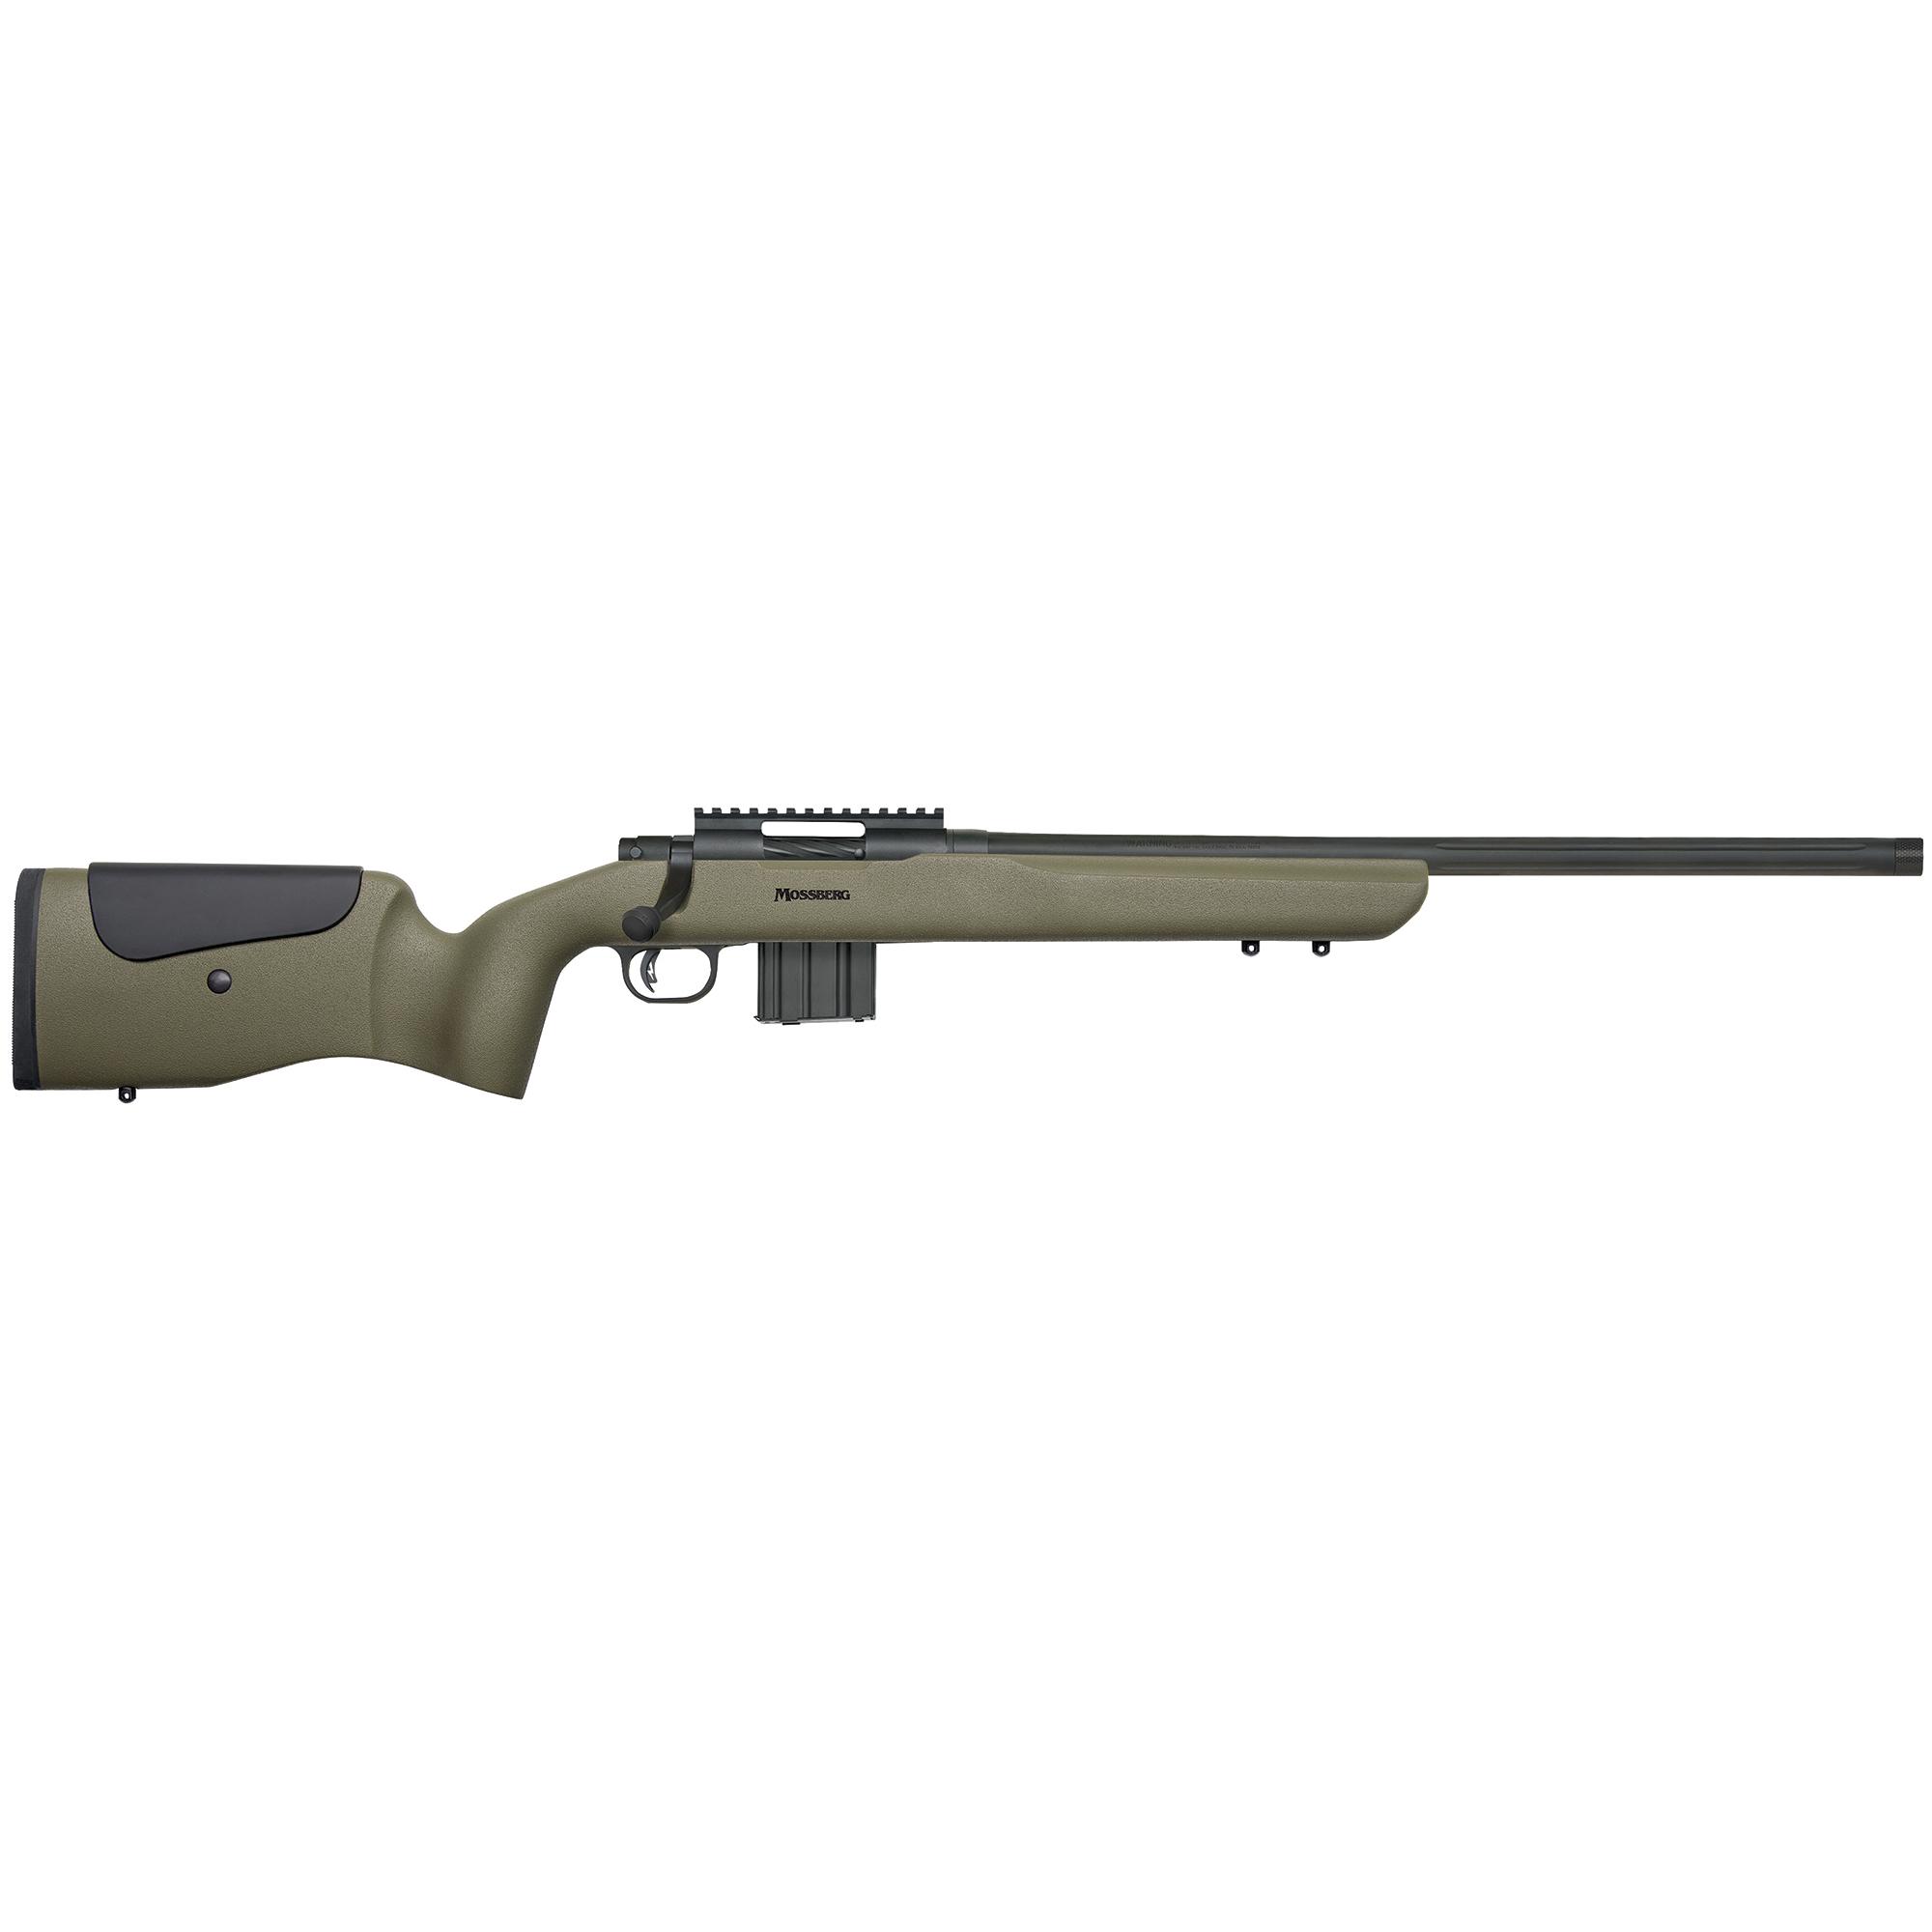 Mossberg MVP LR Centerfire Rifle, 6.5mm Creedmoor, OD Green